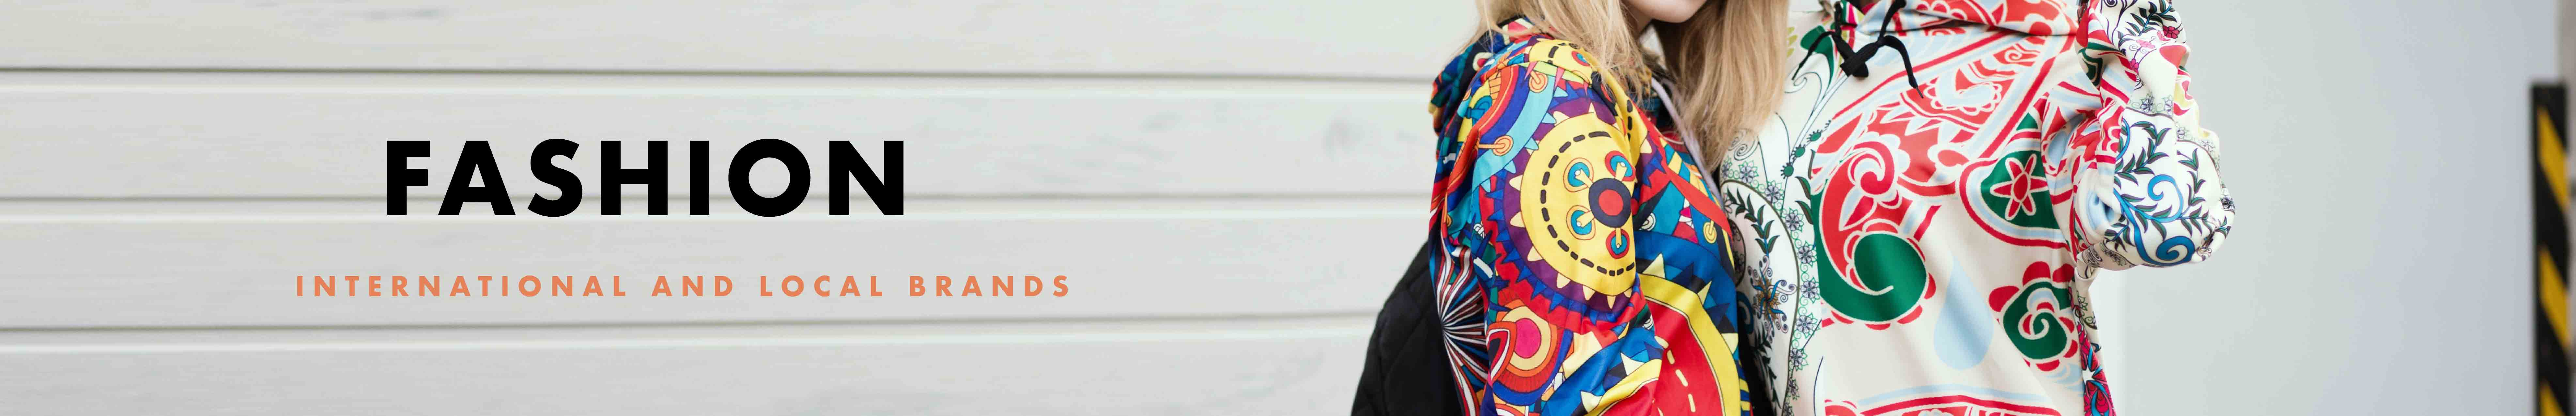 New_fashion_banner_web